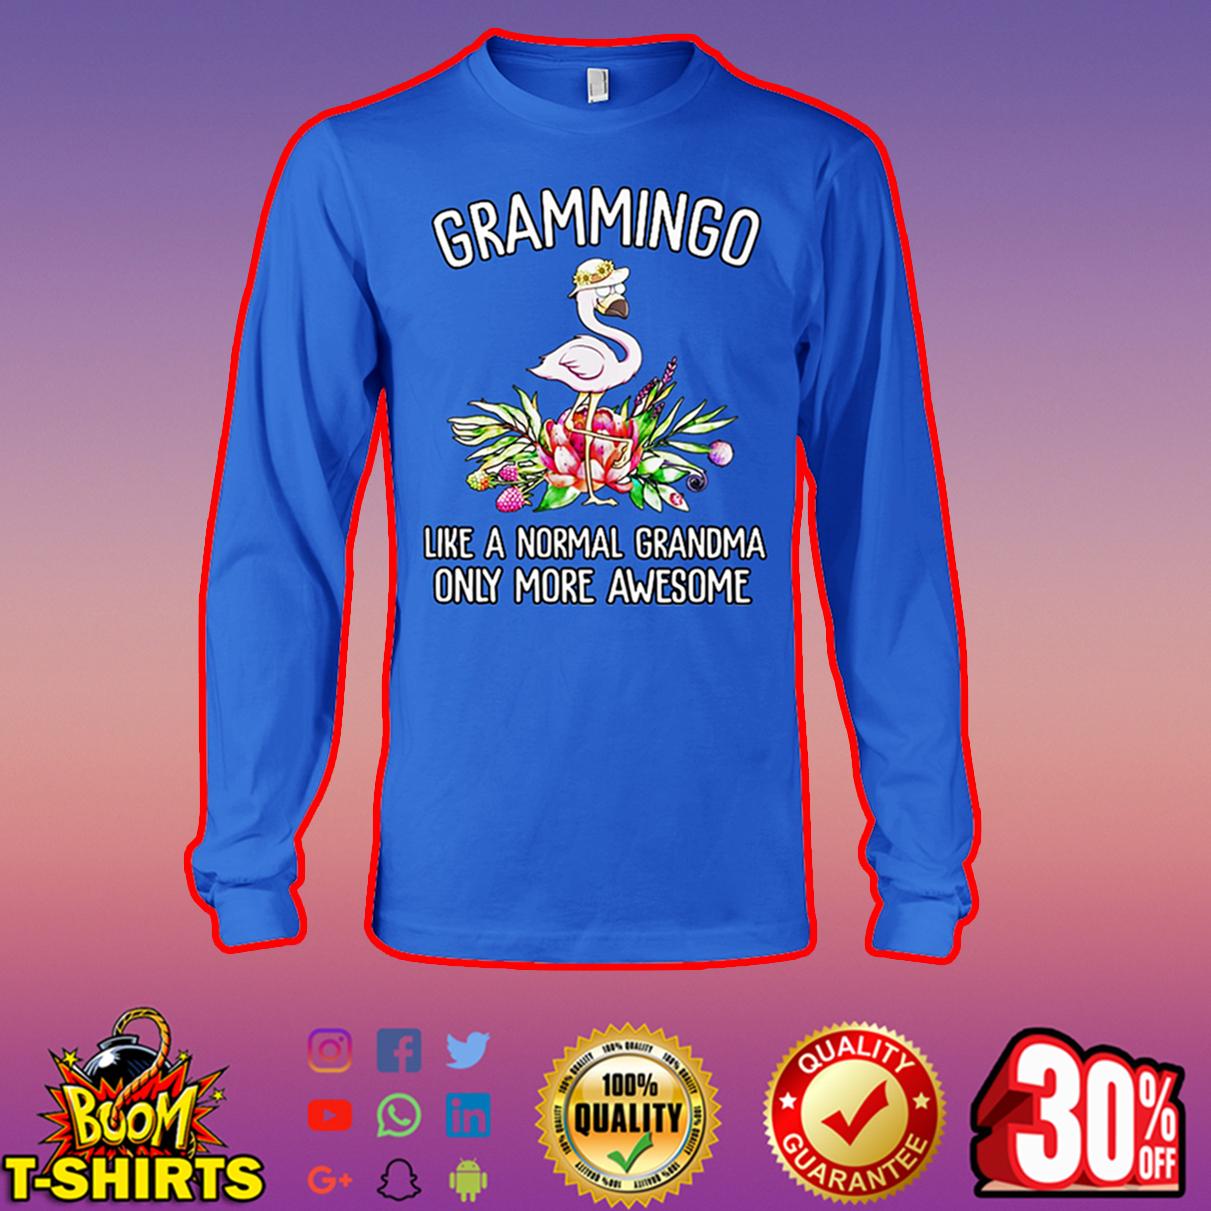 Grammingo like a normal grandma only more awesome long sleeve tee